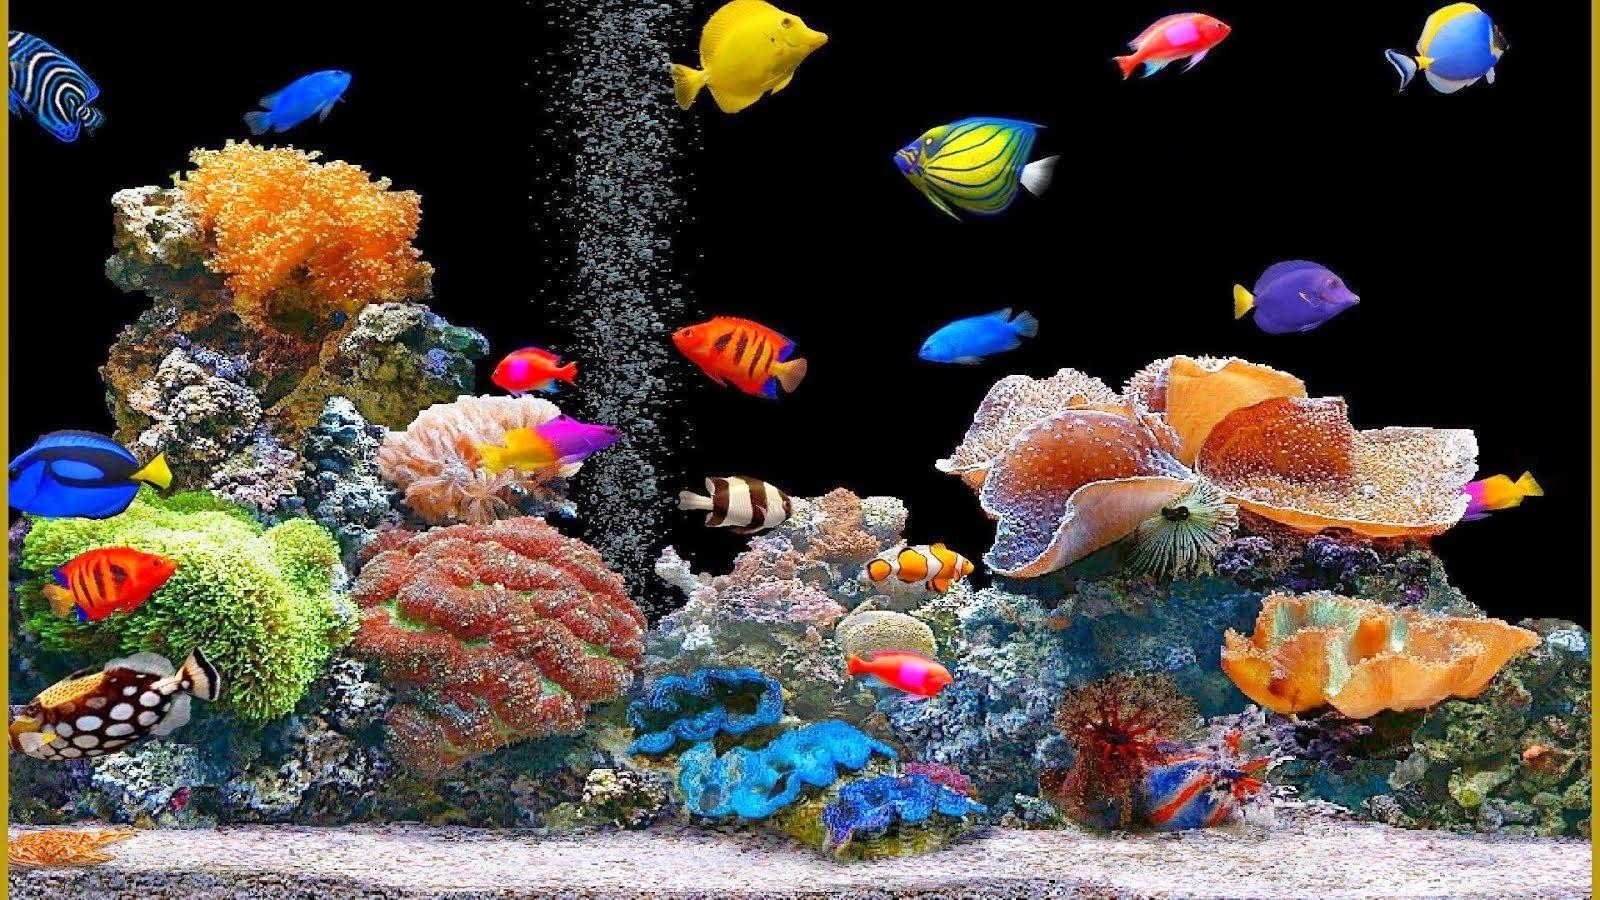 Aquarium fish tank download - Fish